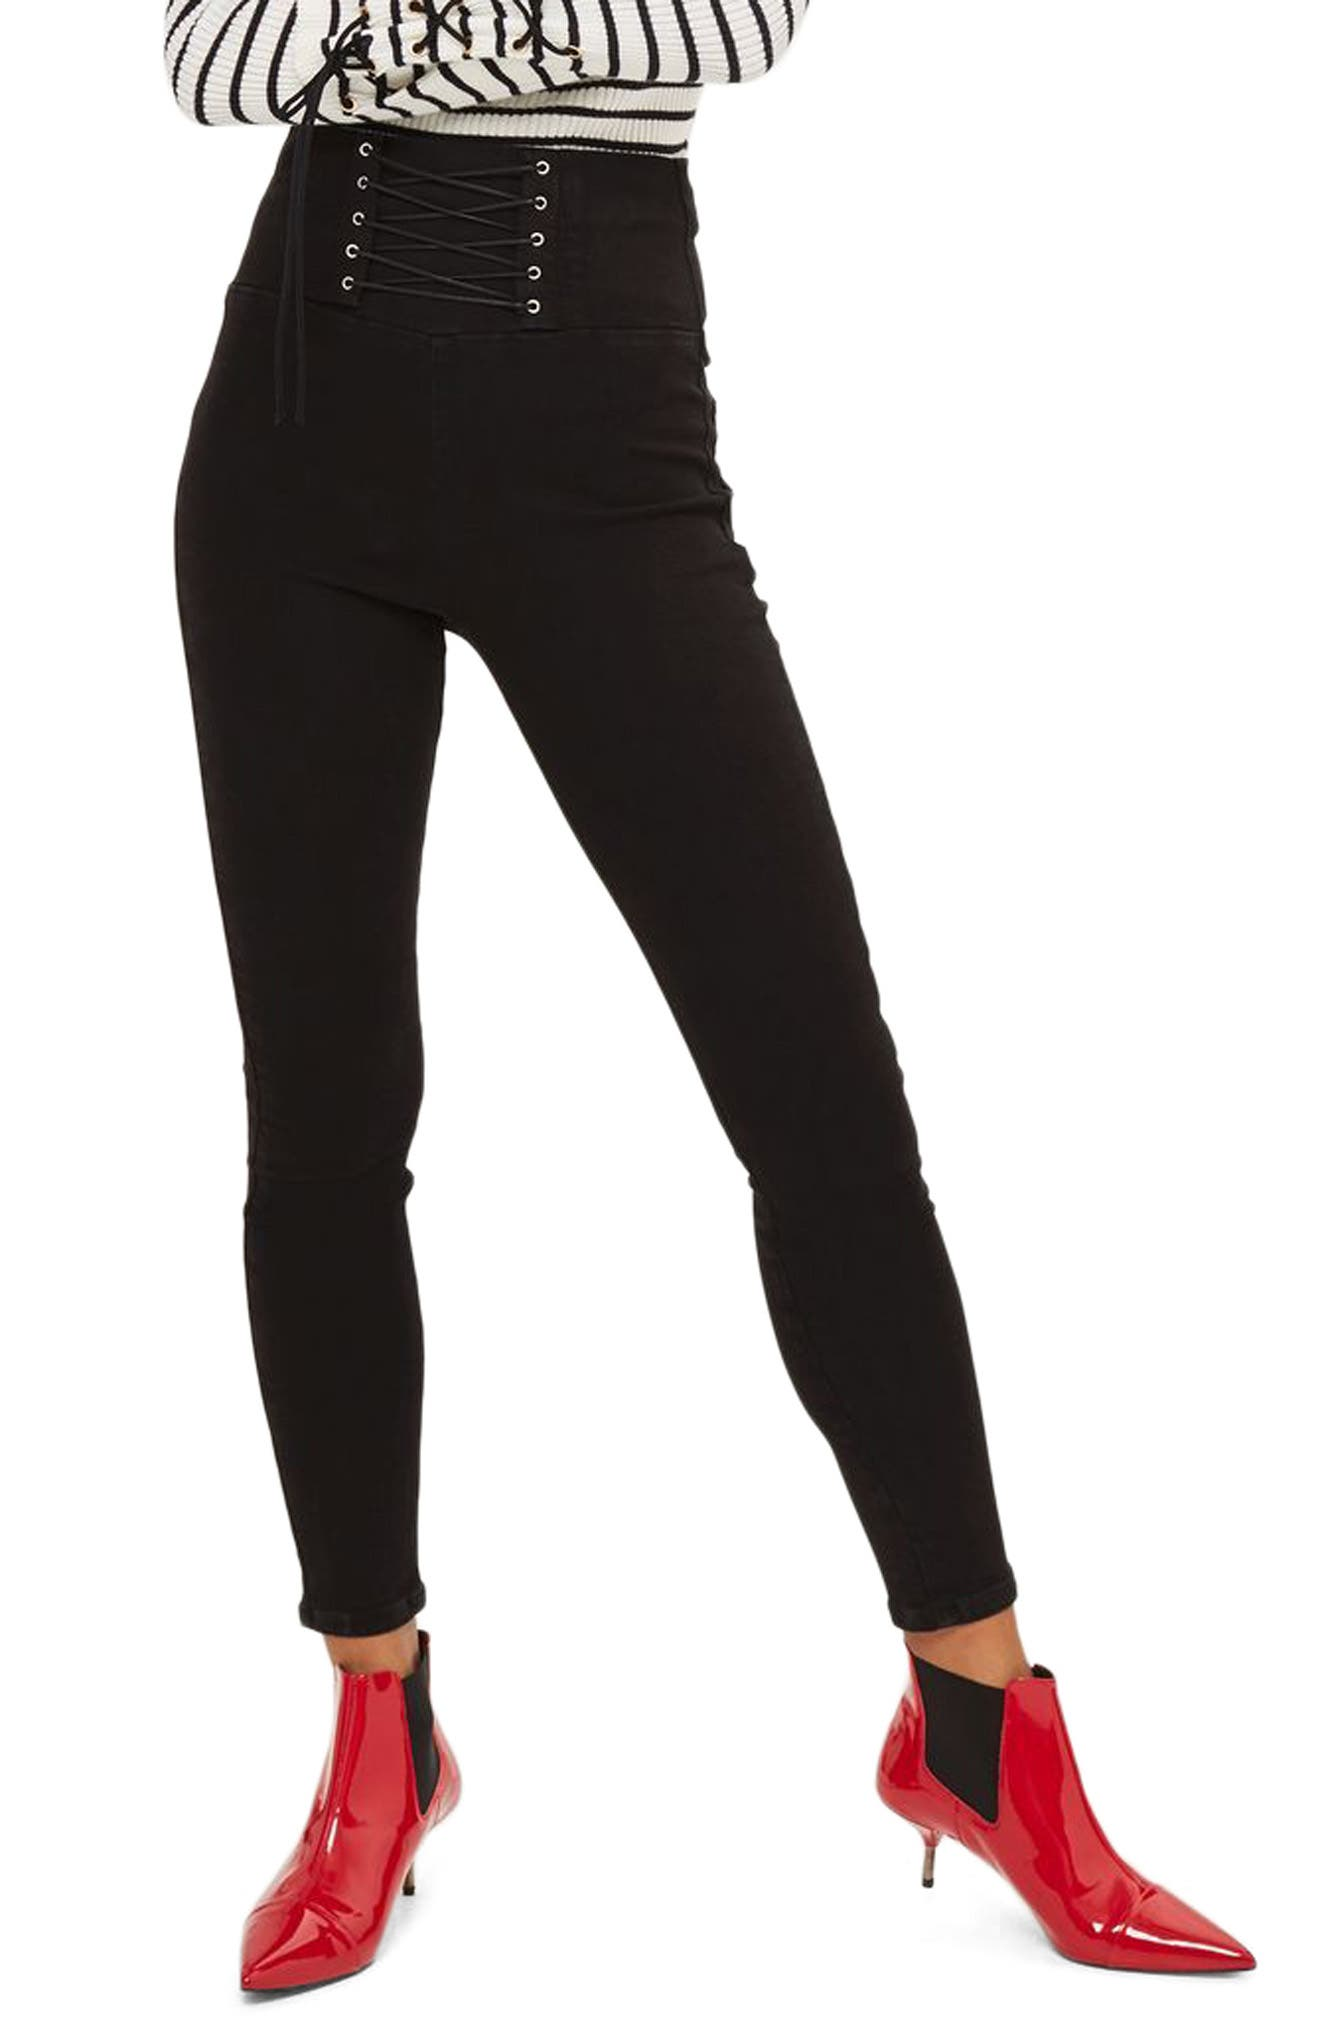 Main Image - Topshop Jamie Corset High Waist Skinny Jeans